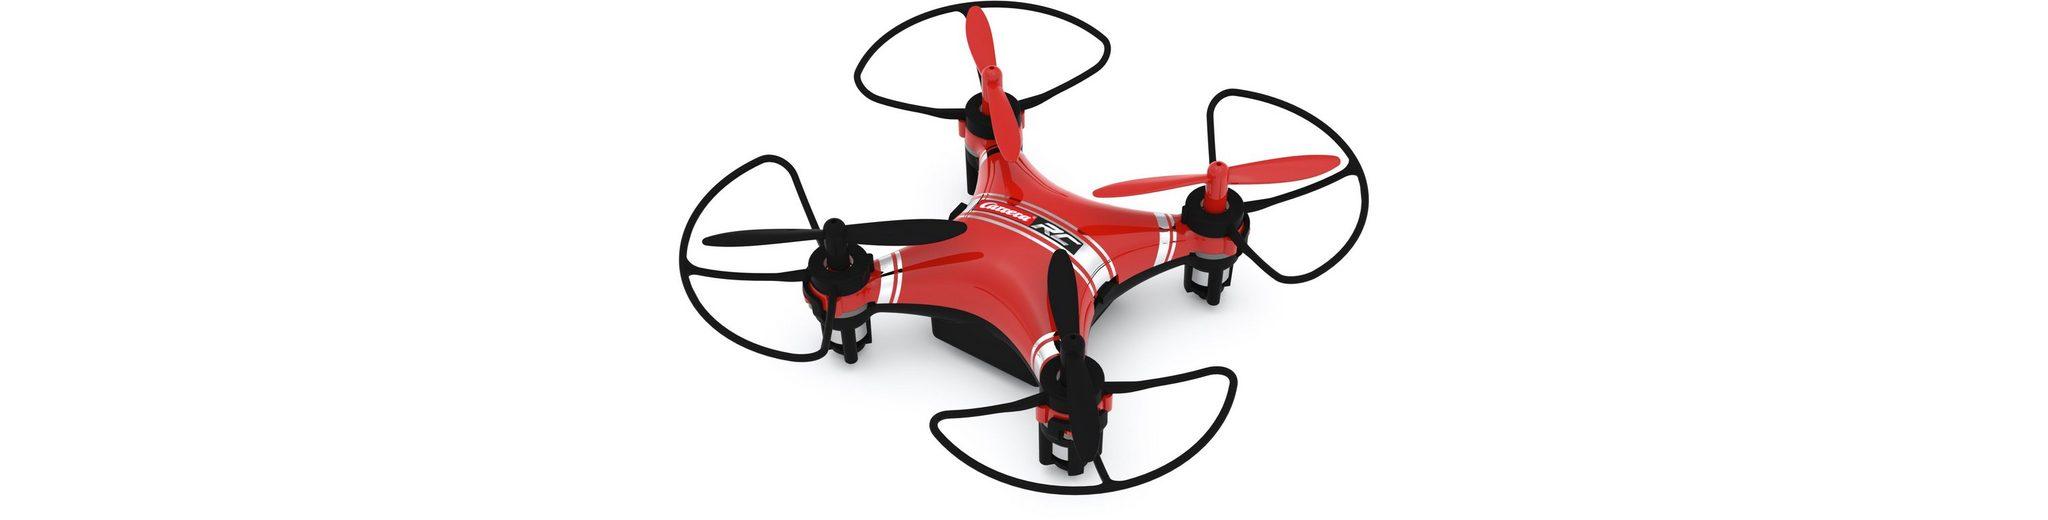 Carrera® RC Quadrocopter Komplett Set mit LED Beleuchtung, »Carrera®RC Air Micro Quadrocopter 2«